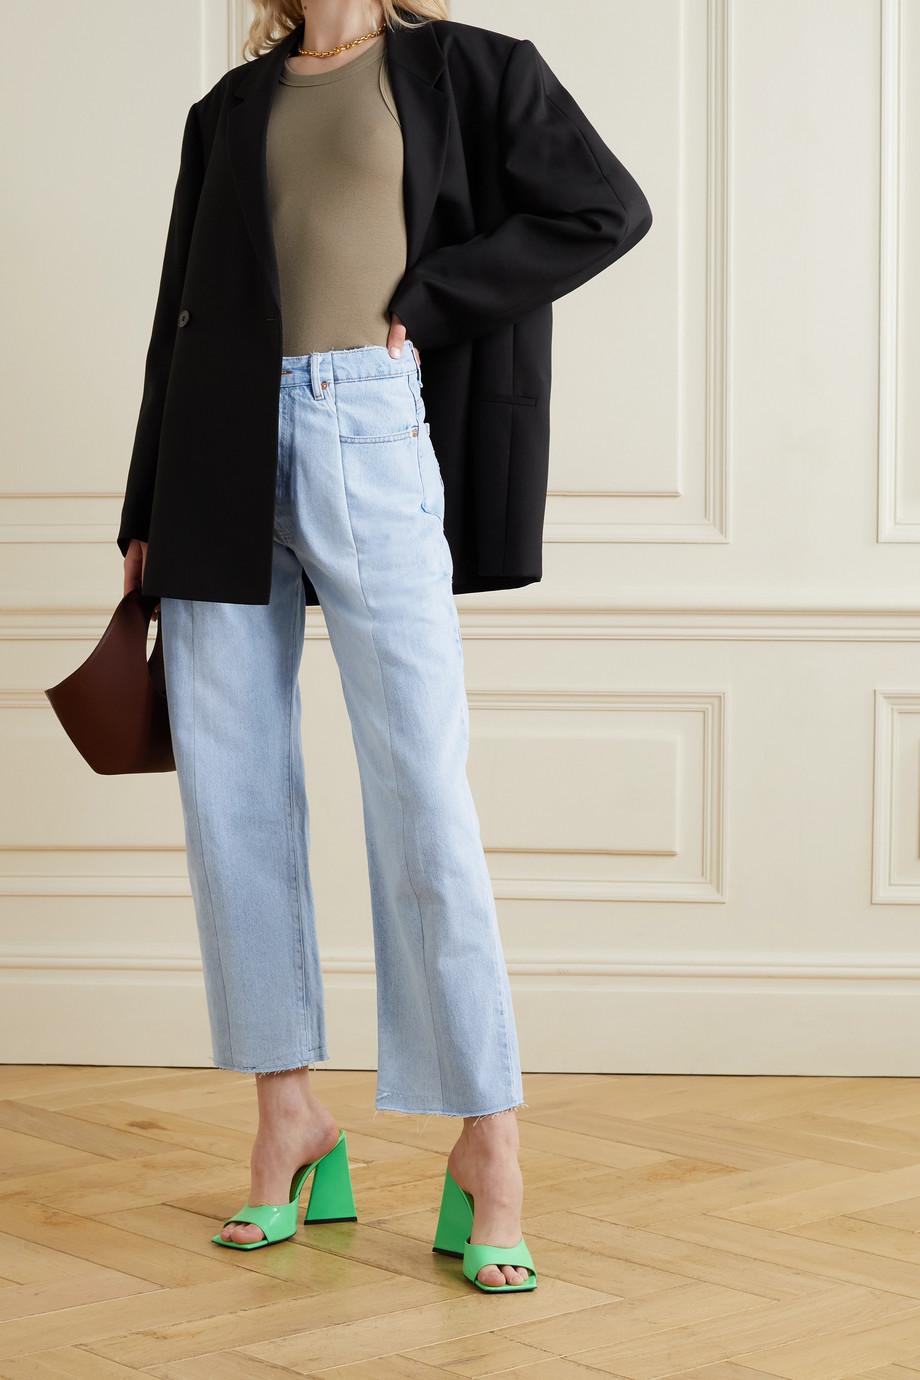 E.L.V. Denim + NET SUSTAIN The Twin frayed two-tone high-rise boyfriend jeans